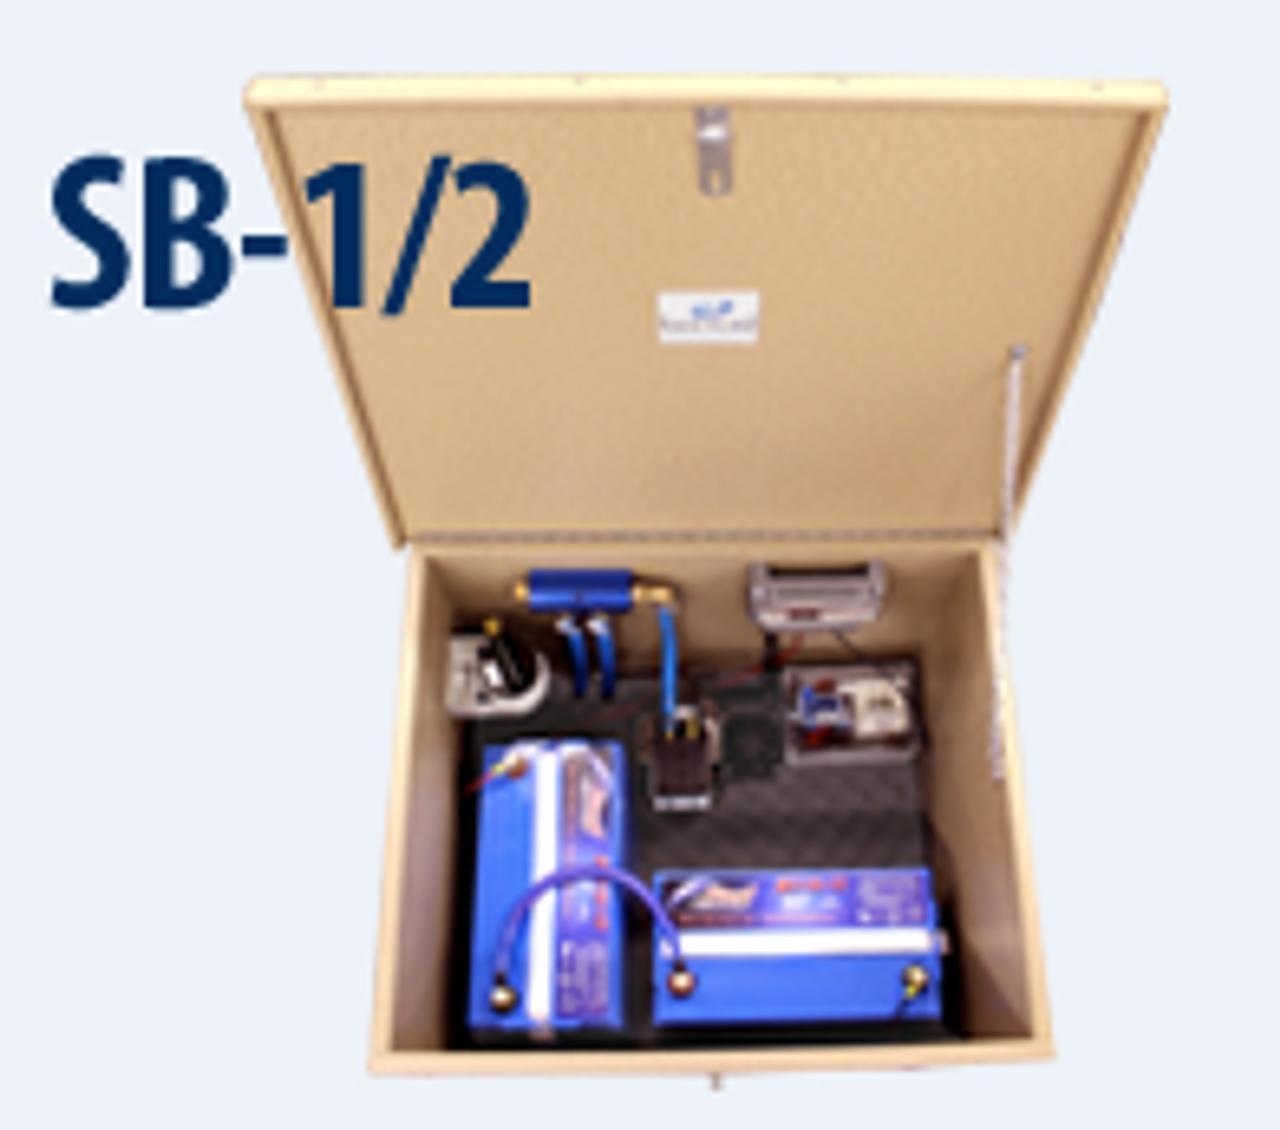 Keeton Solaer Solar Pond Aerator SB1 and SB2 Inside Cabinet